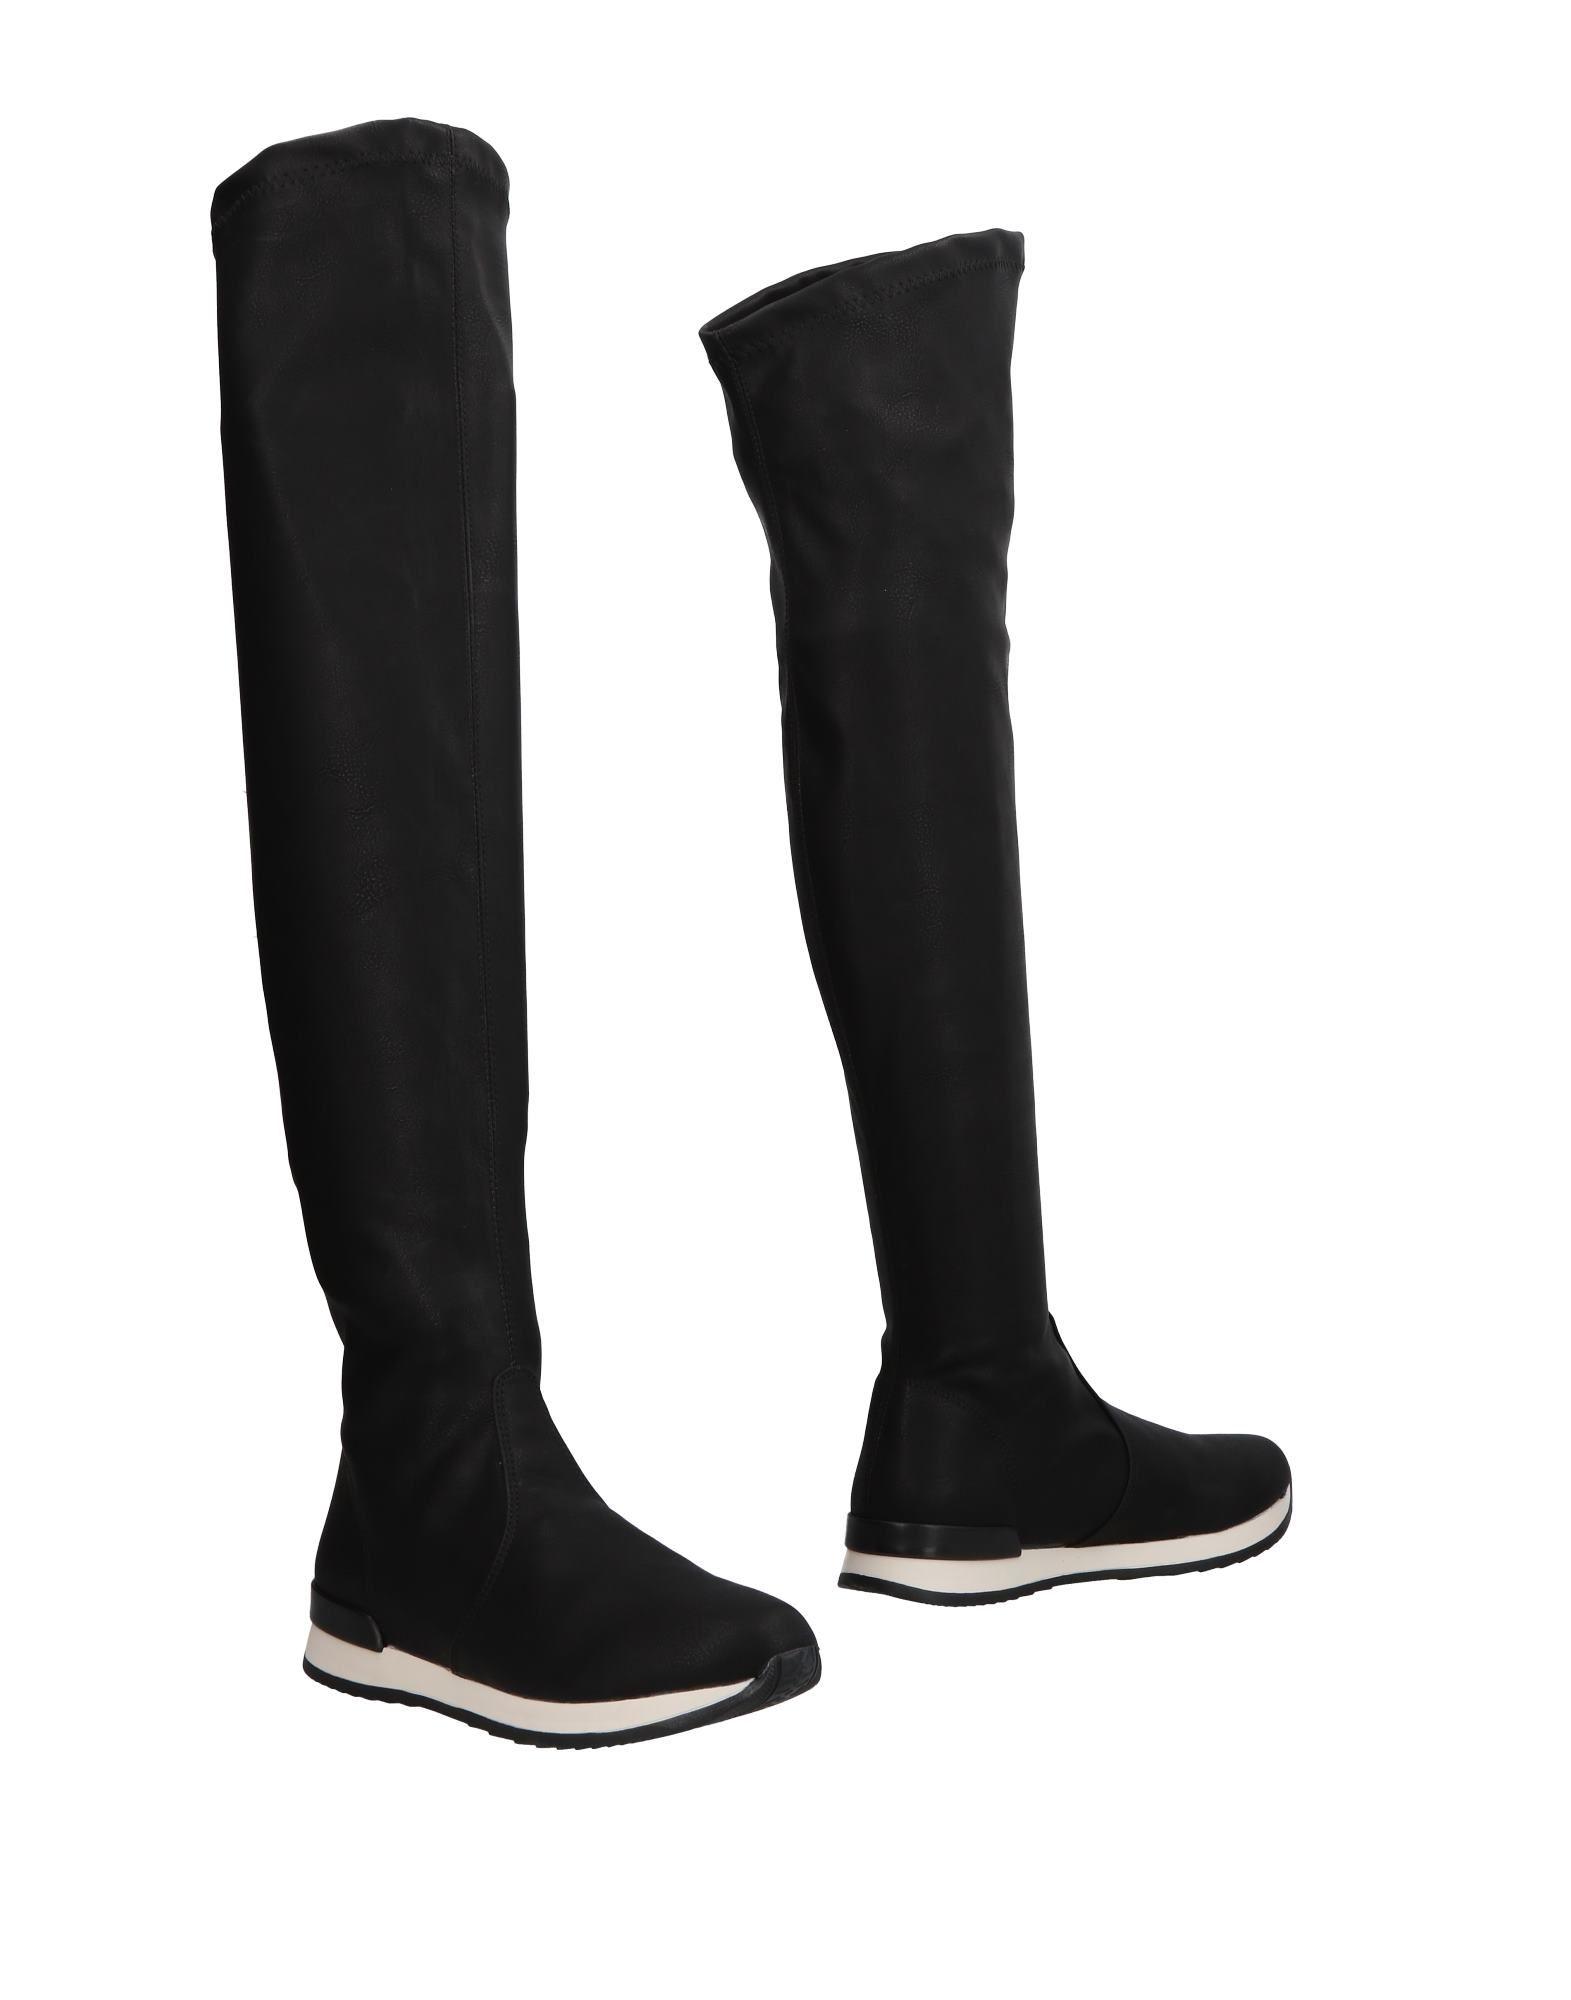 Gut um Rapisardi billige Schuhe zu tragenNr Rapisardi um Stiefel Damen  11505051LM 3104ac